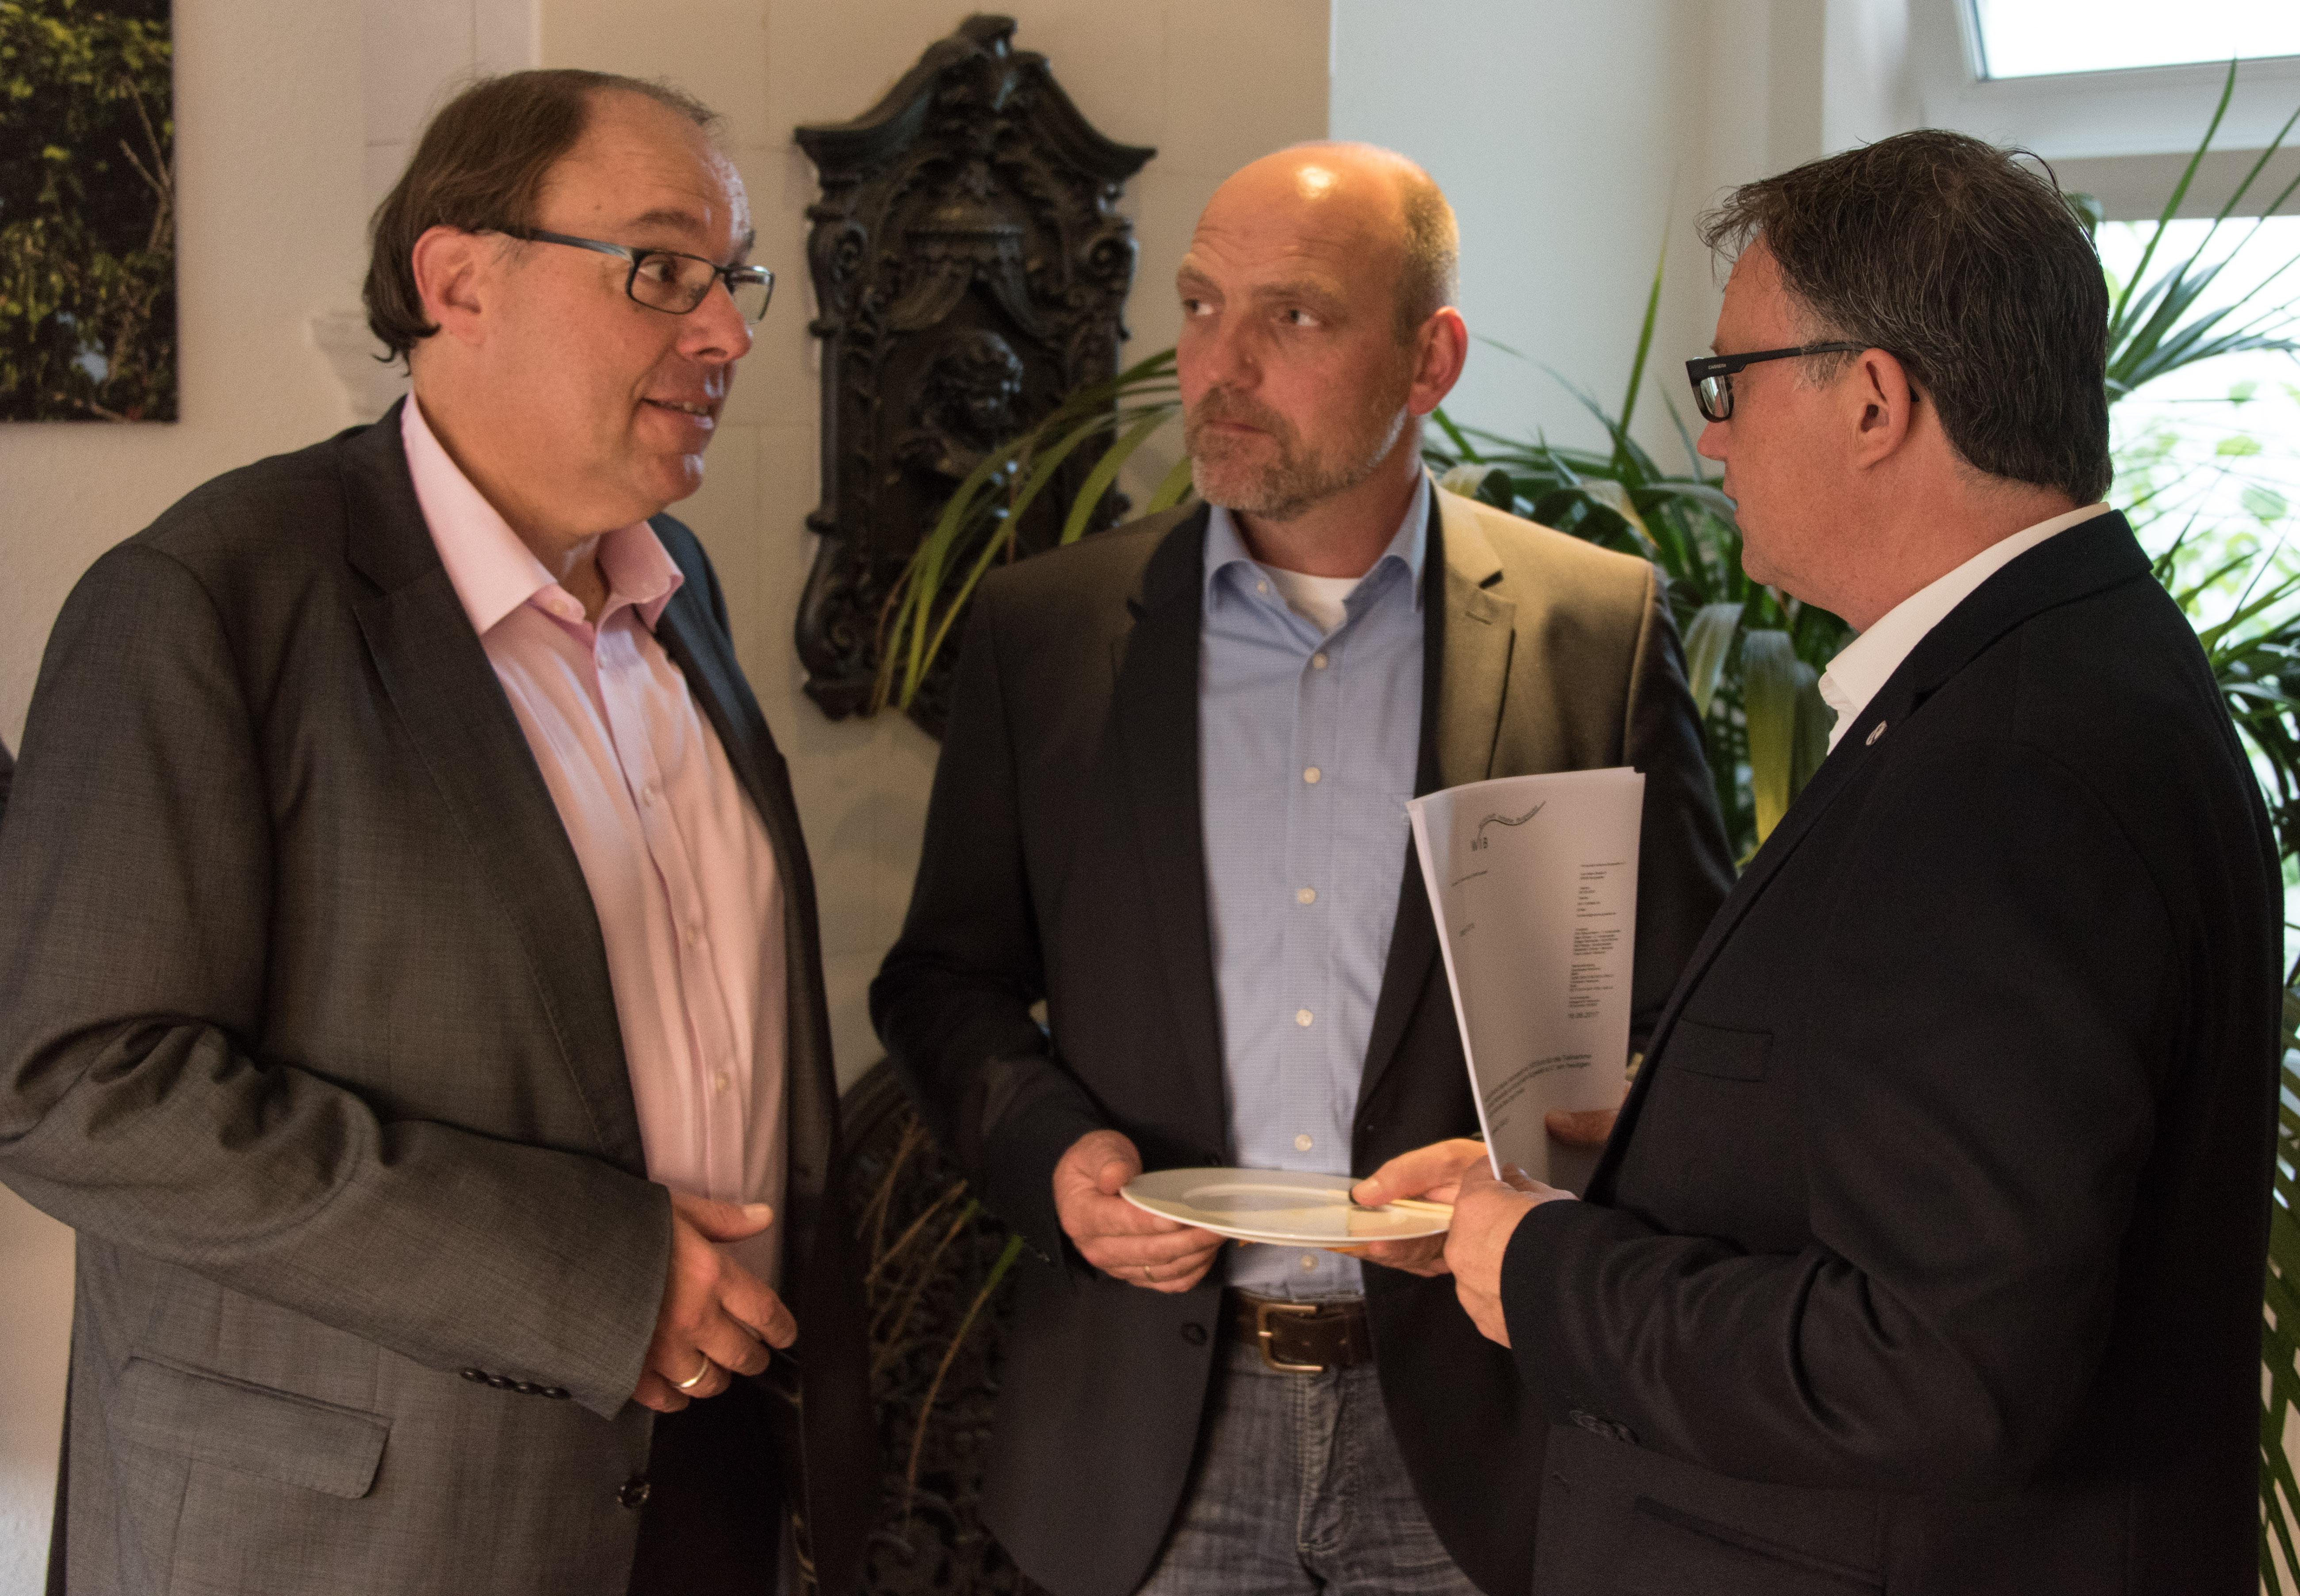 vl. Gregor Schneider, Uwe Haster, Frank Leibelt